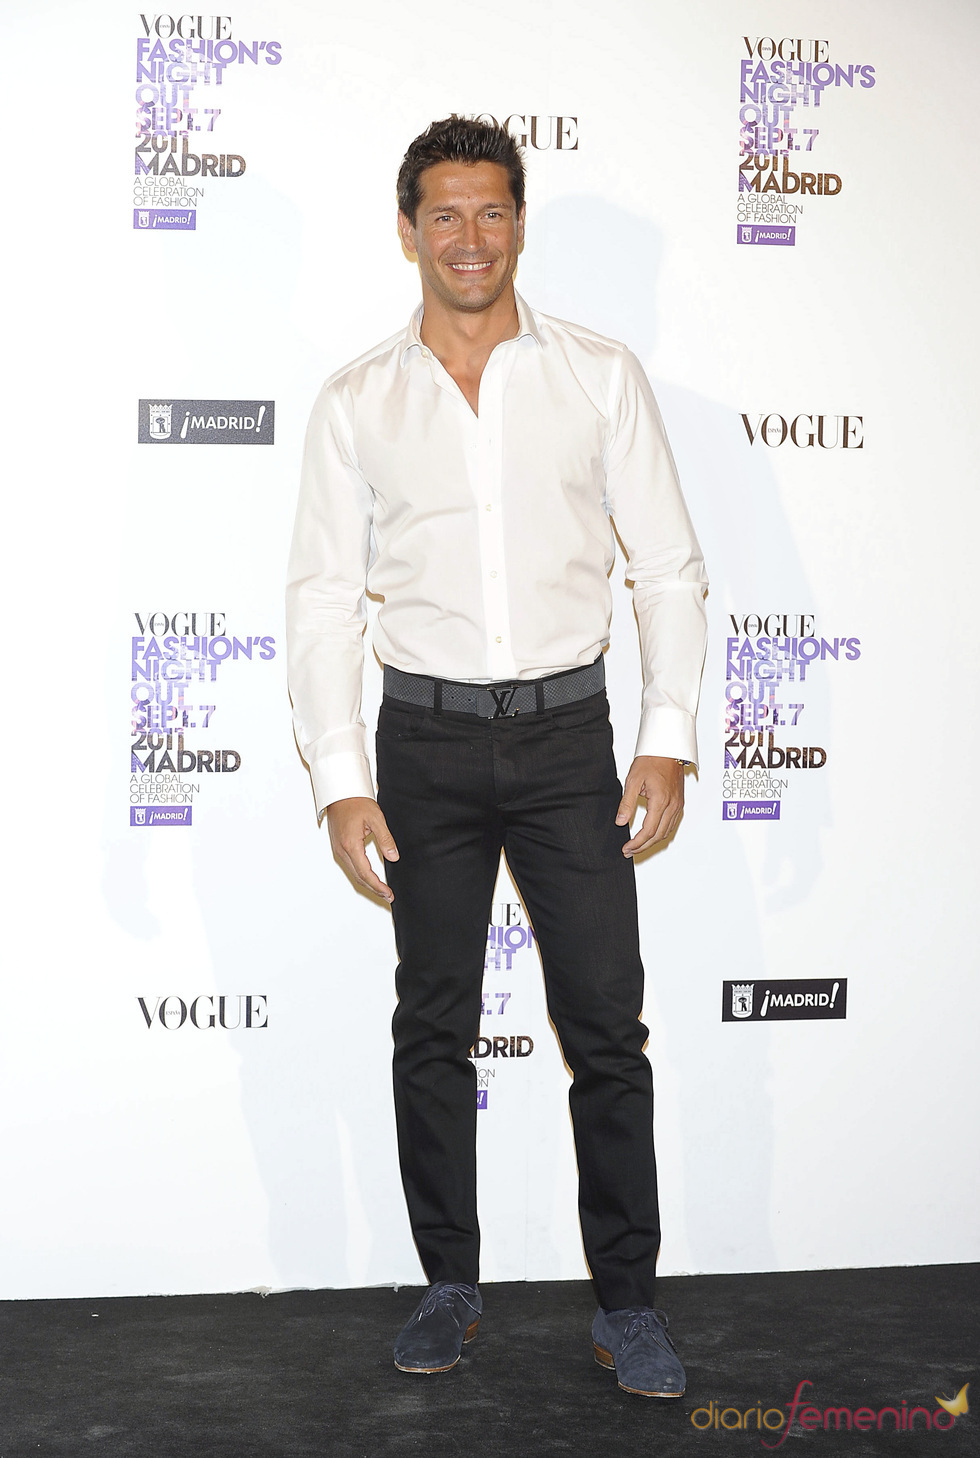 Jaime Cantizano durante la Vogue Fashion Night Out Madrid 2011